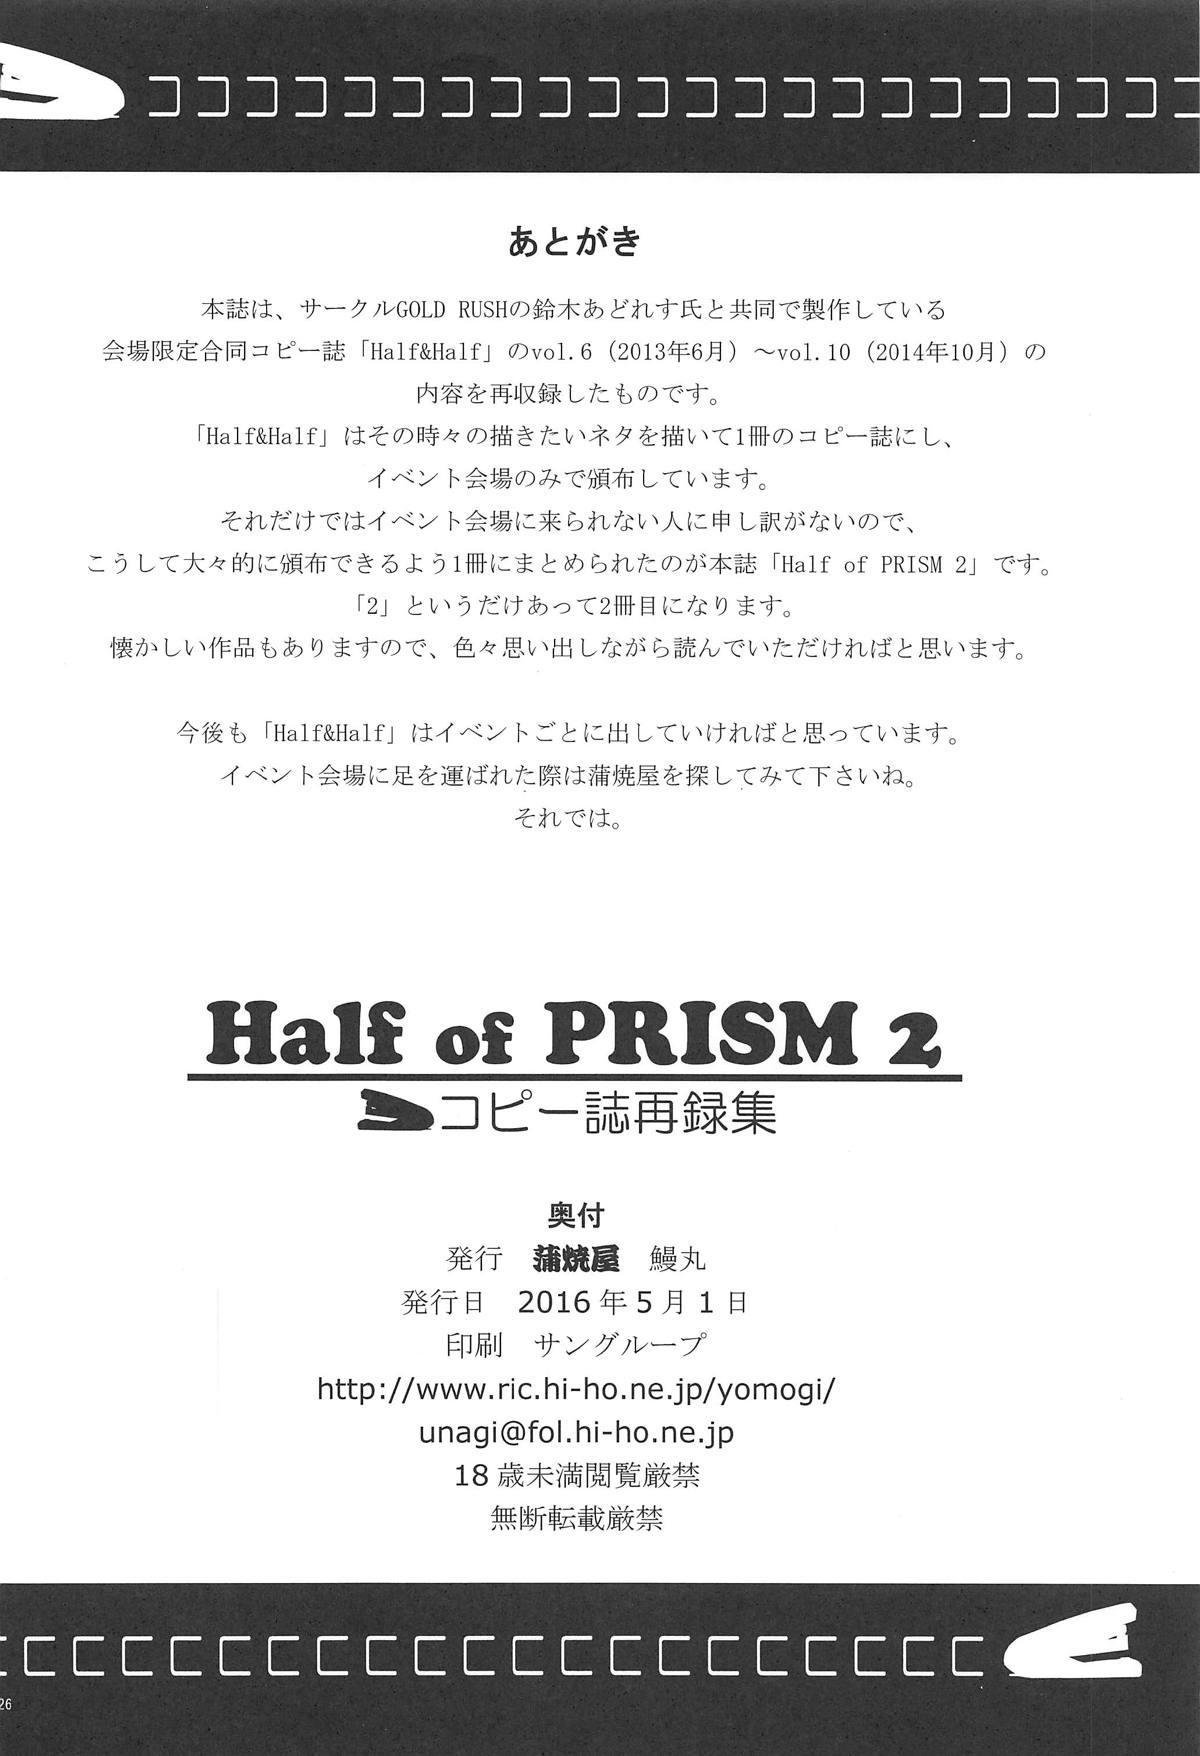 Half of PRISM 2 Copy-shi Sairokushuu 24